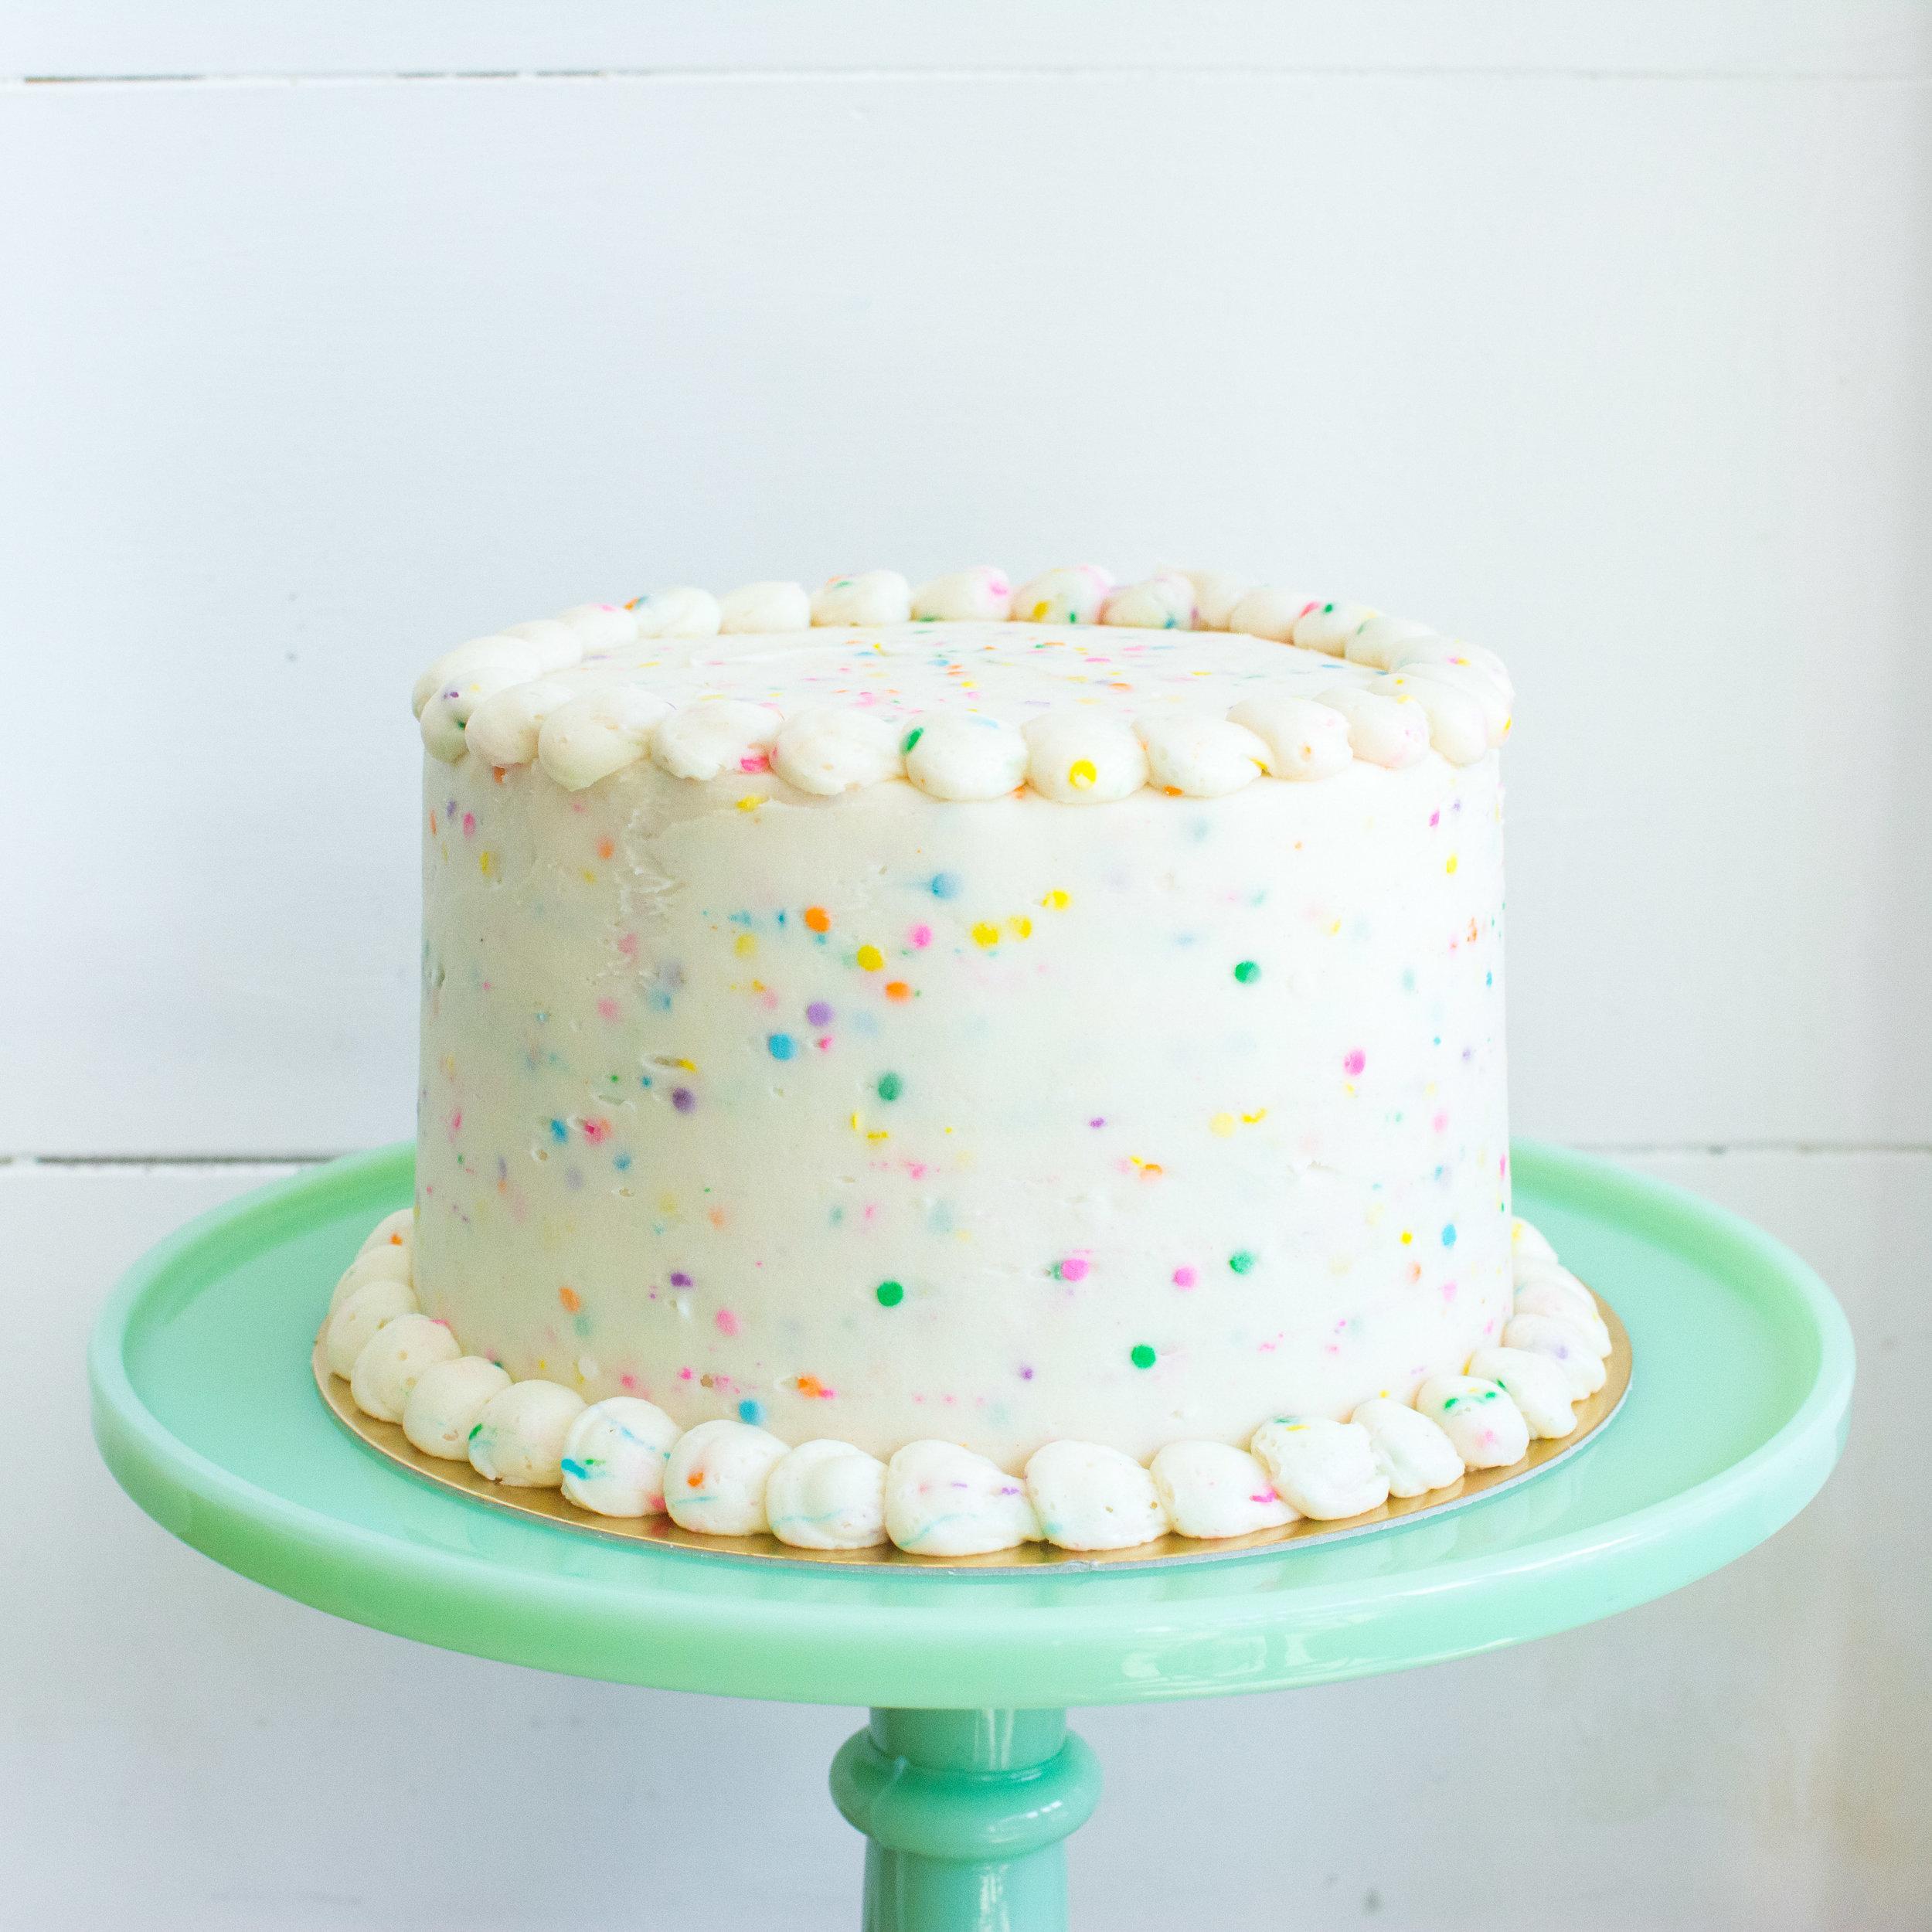 Vanilla Celebration Cake with Vanilla Buttercream and Rainbow Sprinkles